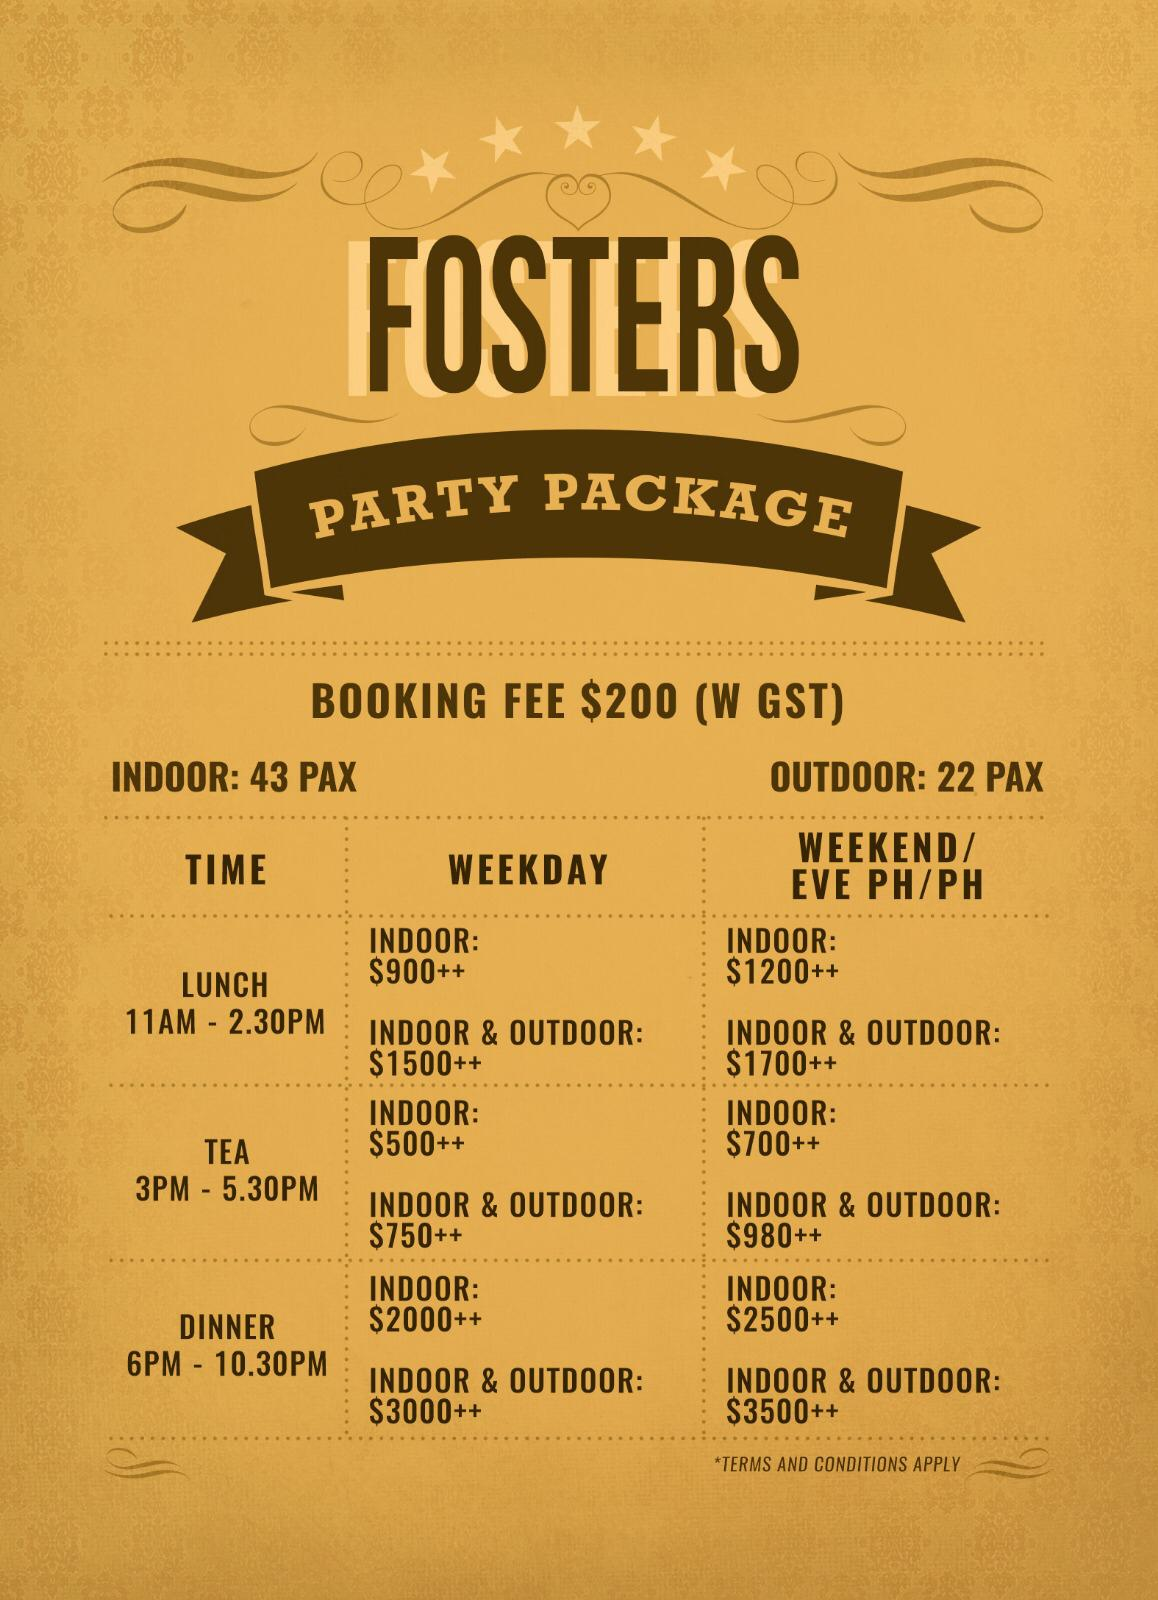 Fosters Restaurant - Event Hosting.jpg